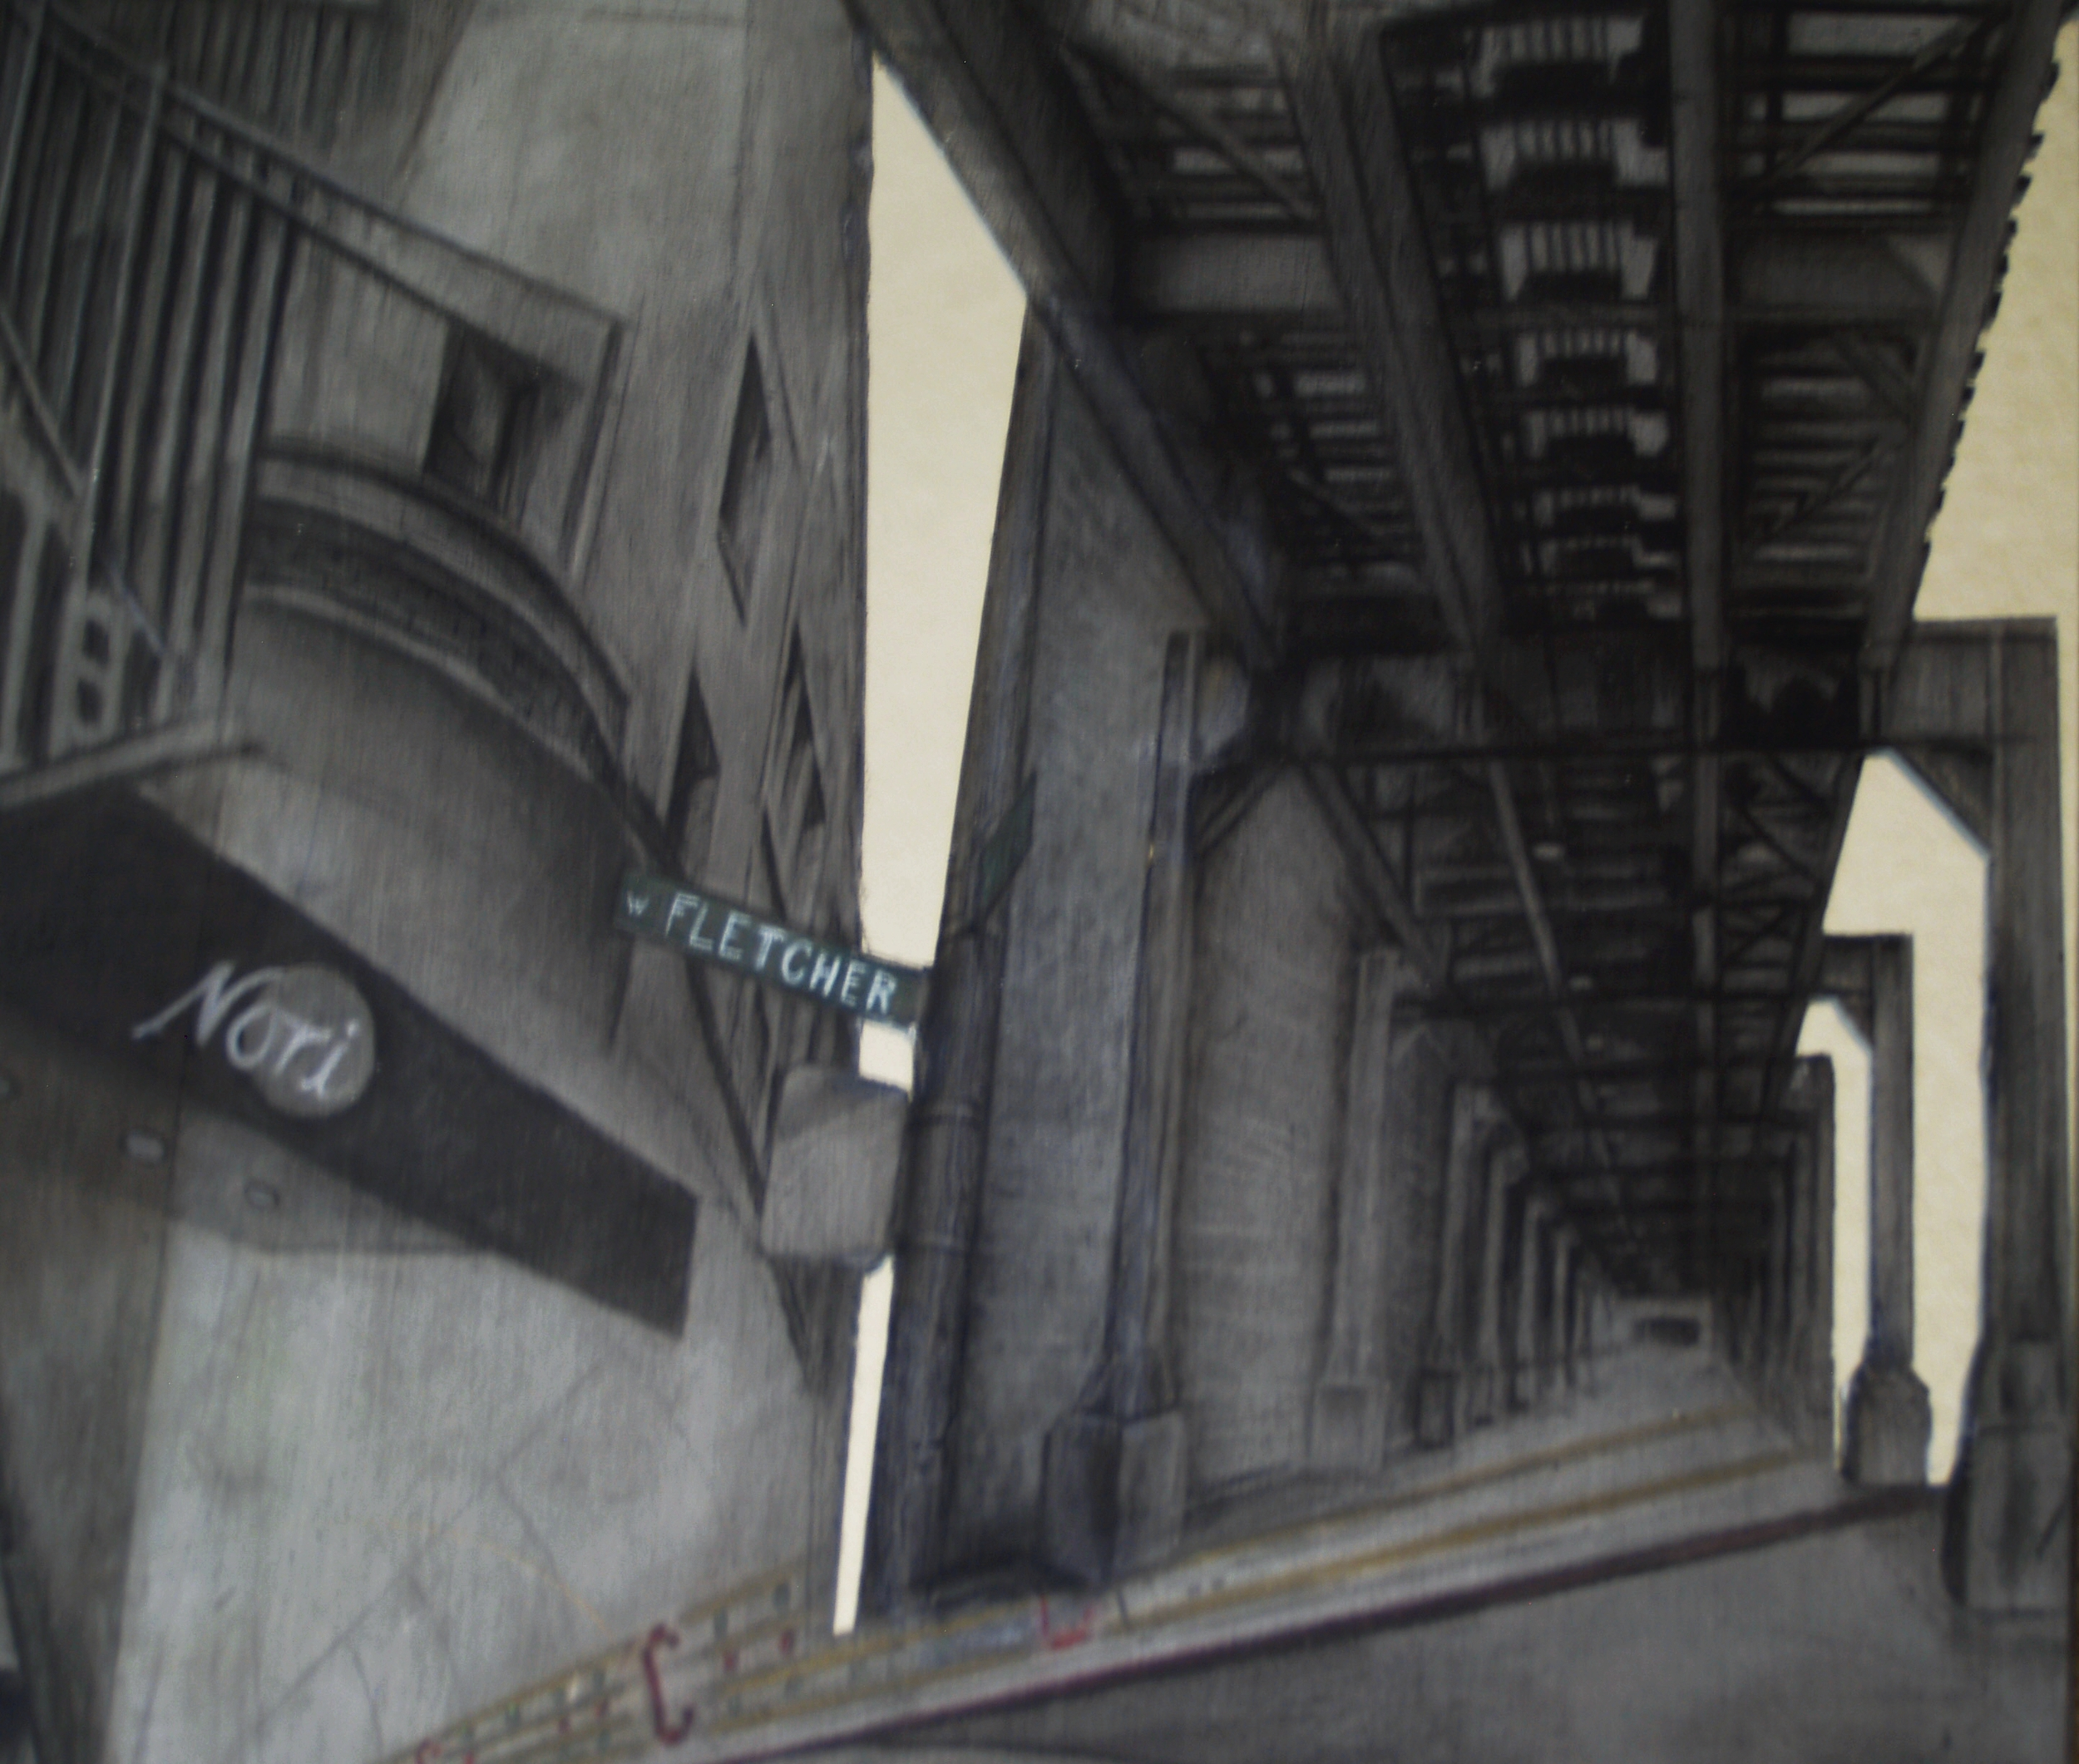 Fletcher street sign, sushi emblem, under the train tracks